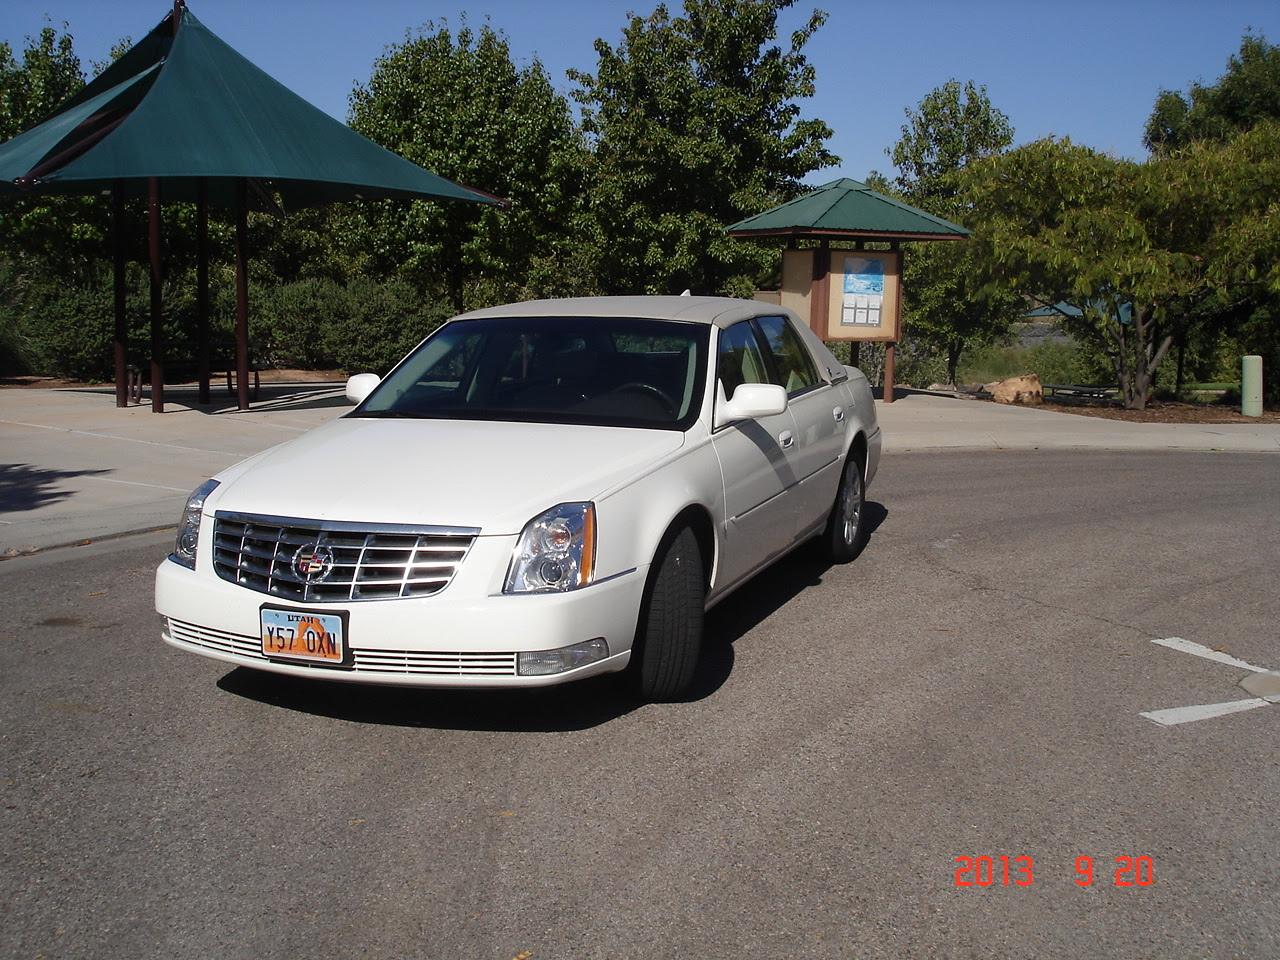 2010 Cadillac DTS - Review - CarGurus